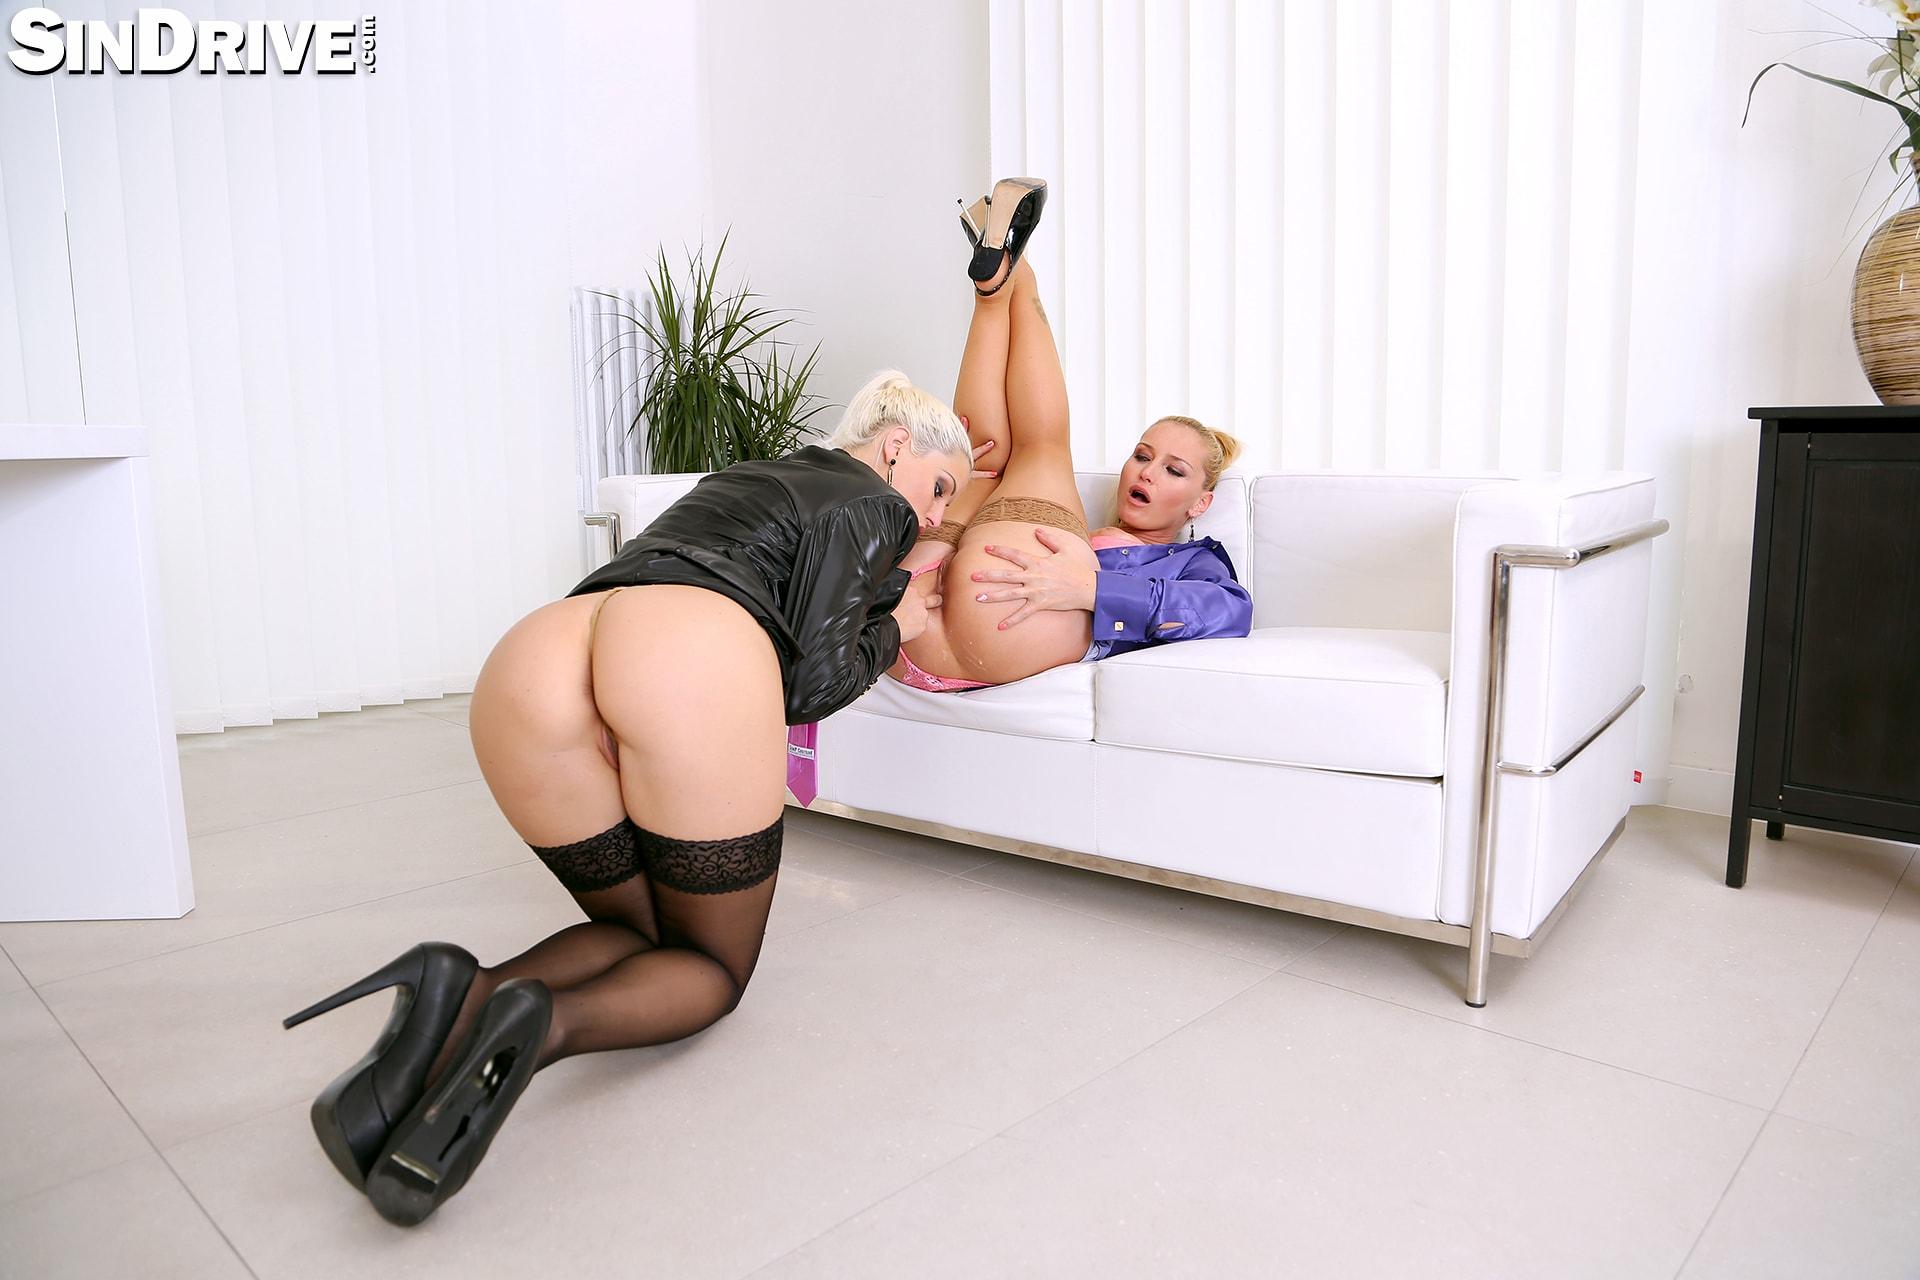 Erika nicole porn